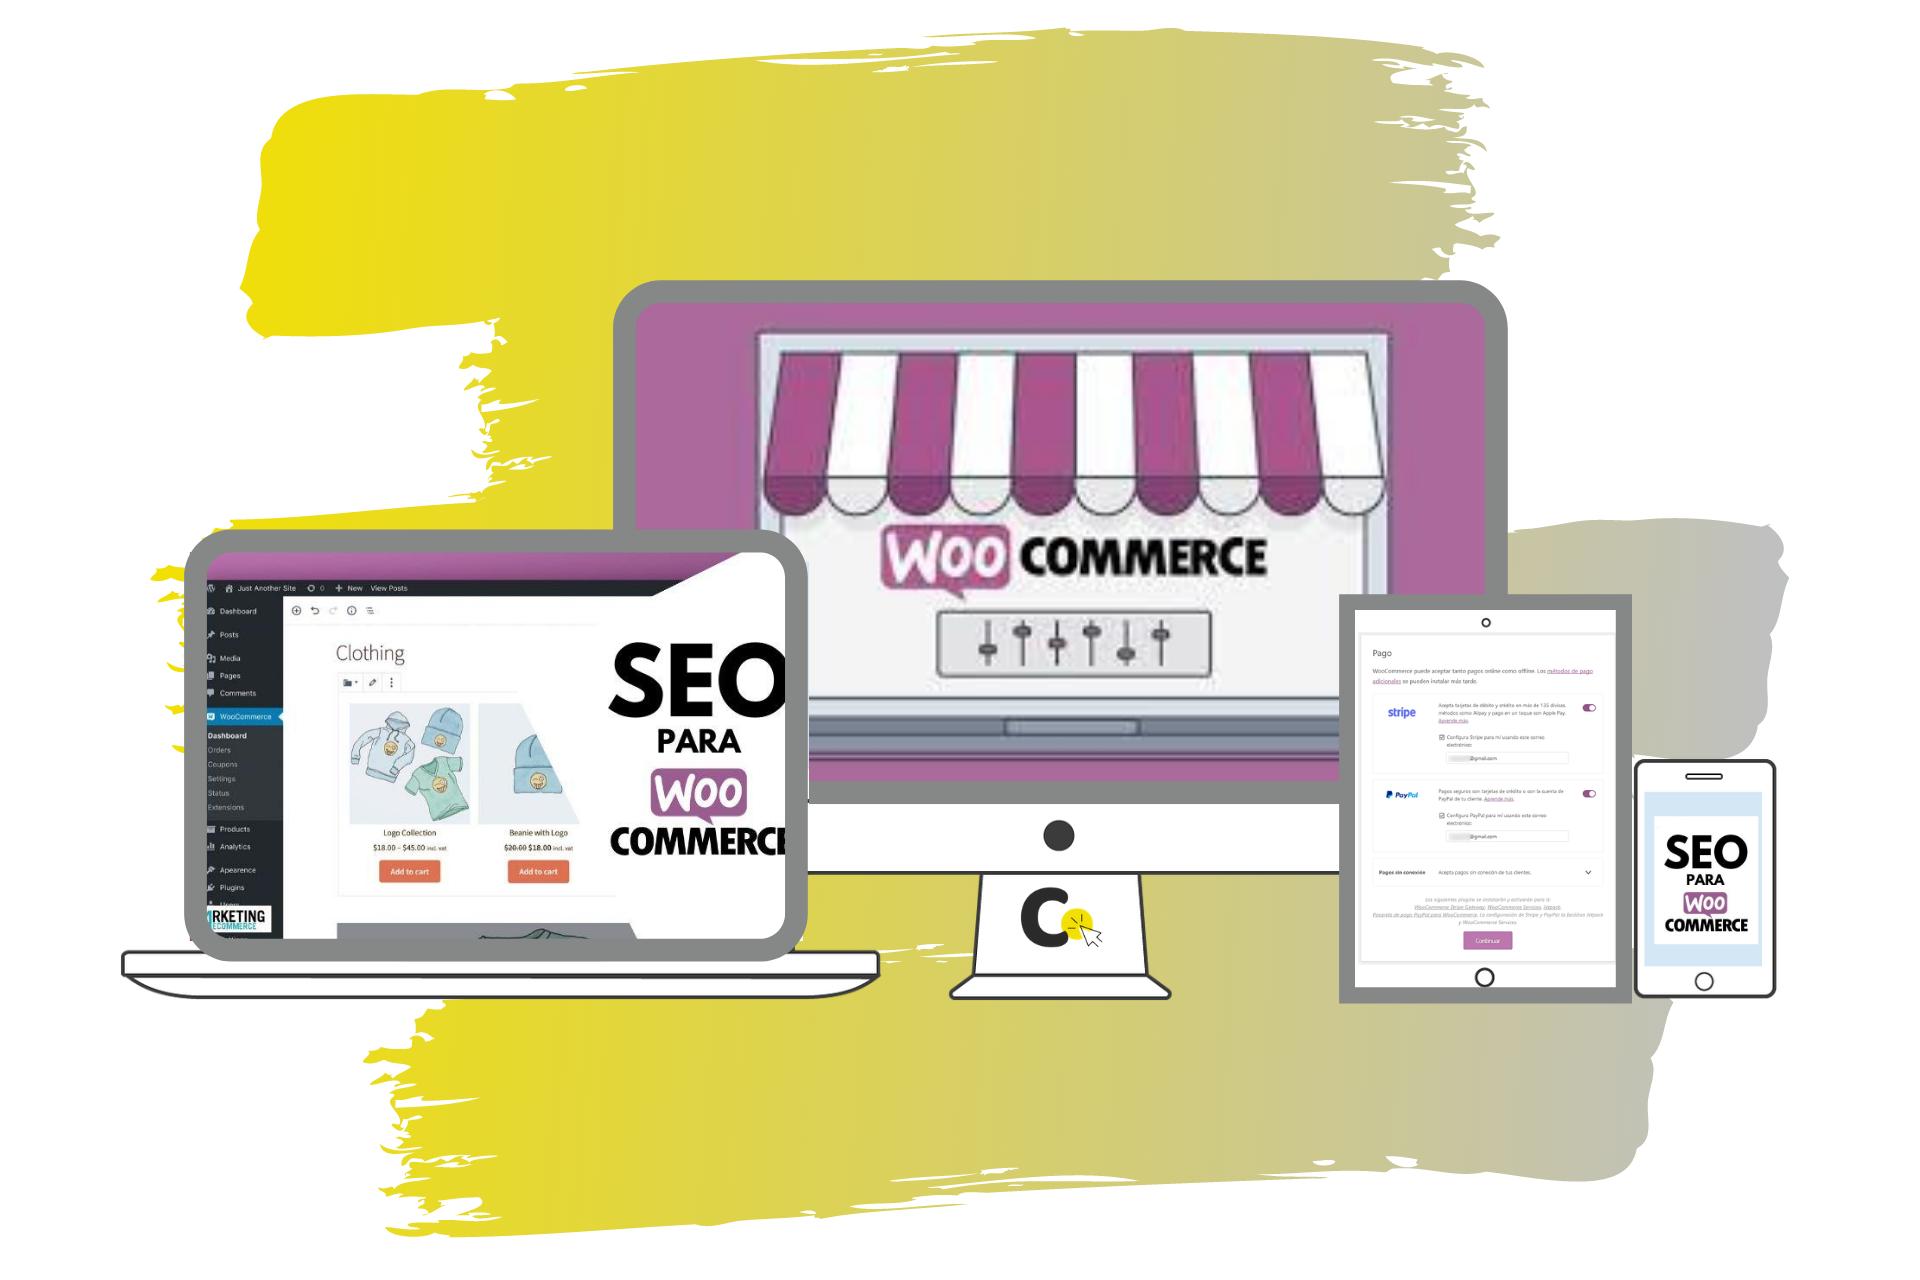 pagina web con woo commerce